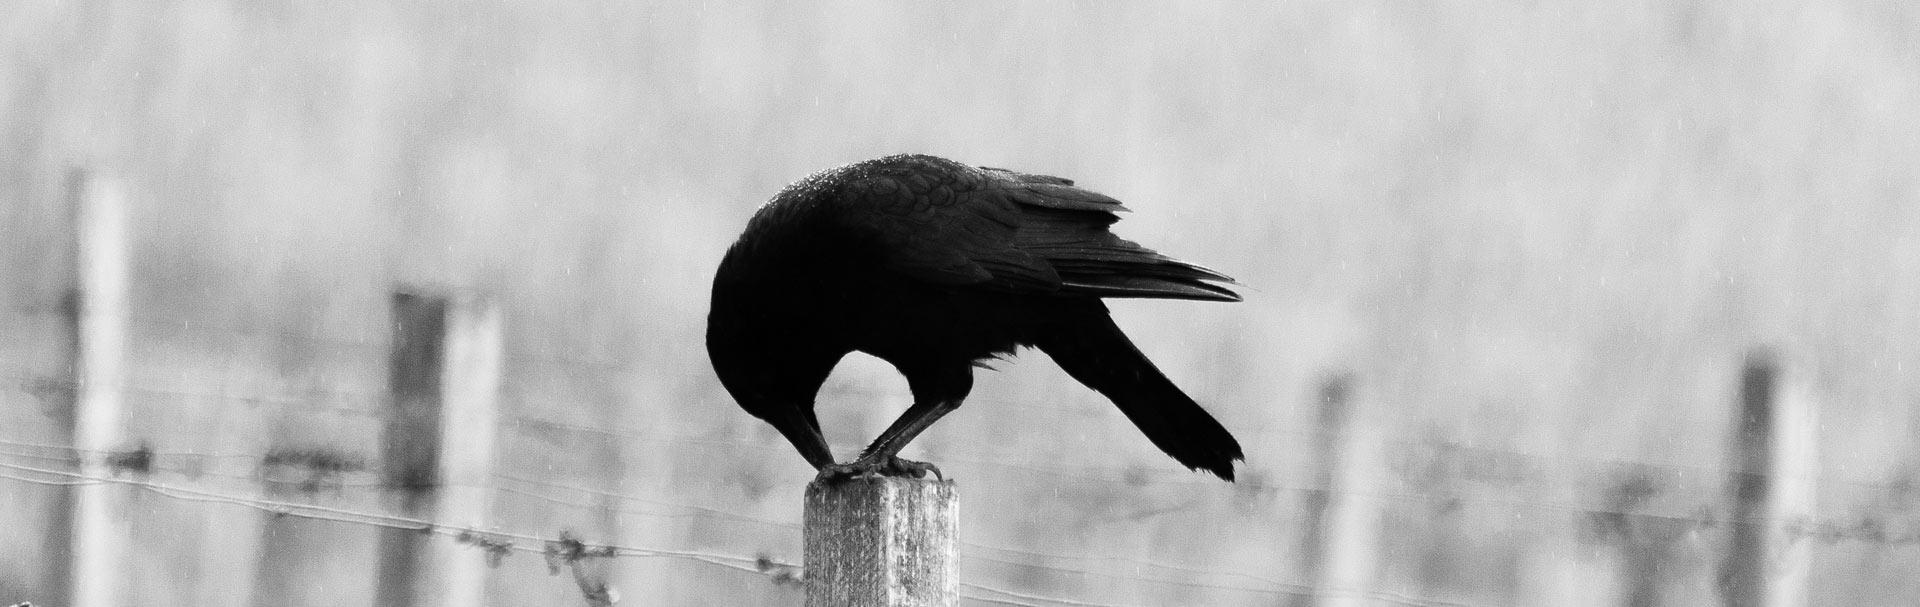 Corvid.Studio Website Maintenance - Photo of crow on fence post - Unsplash image by Hannes Wolf